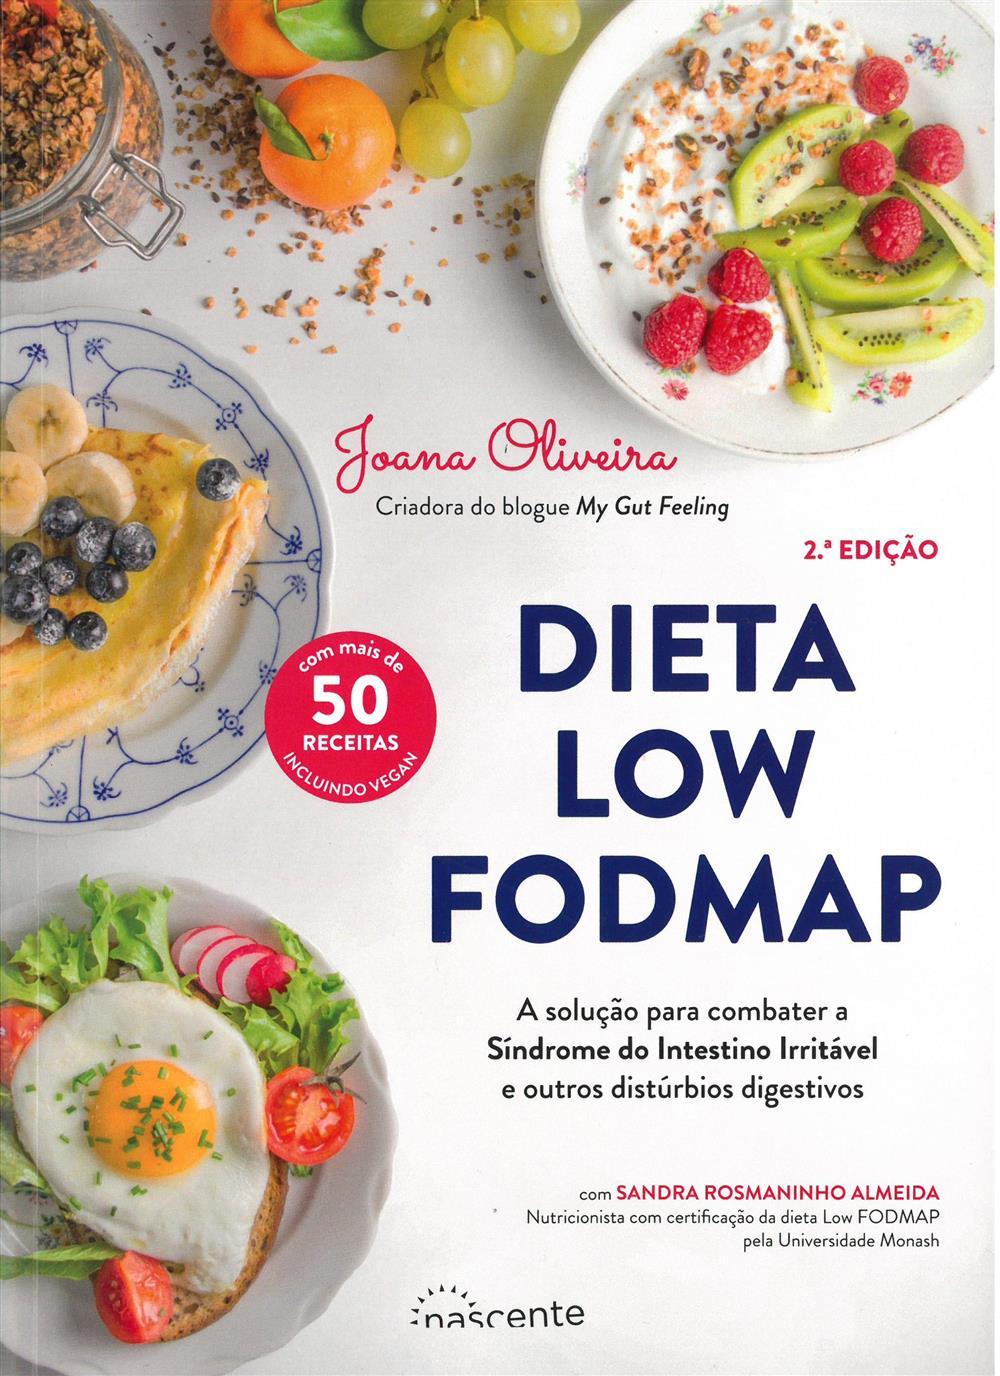 OLIVEIRA, Joana (2021). Dieta low FODMAP.jpg